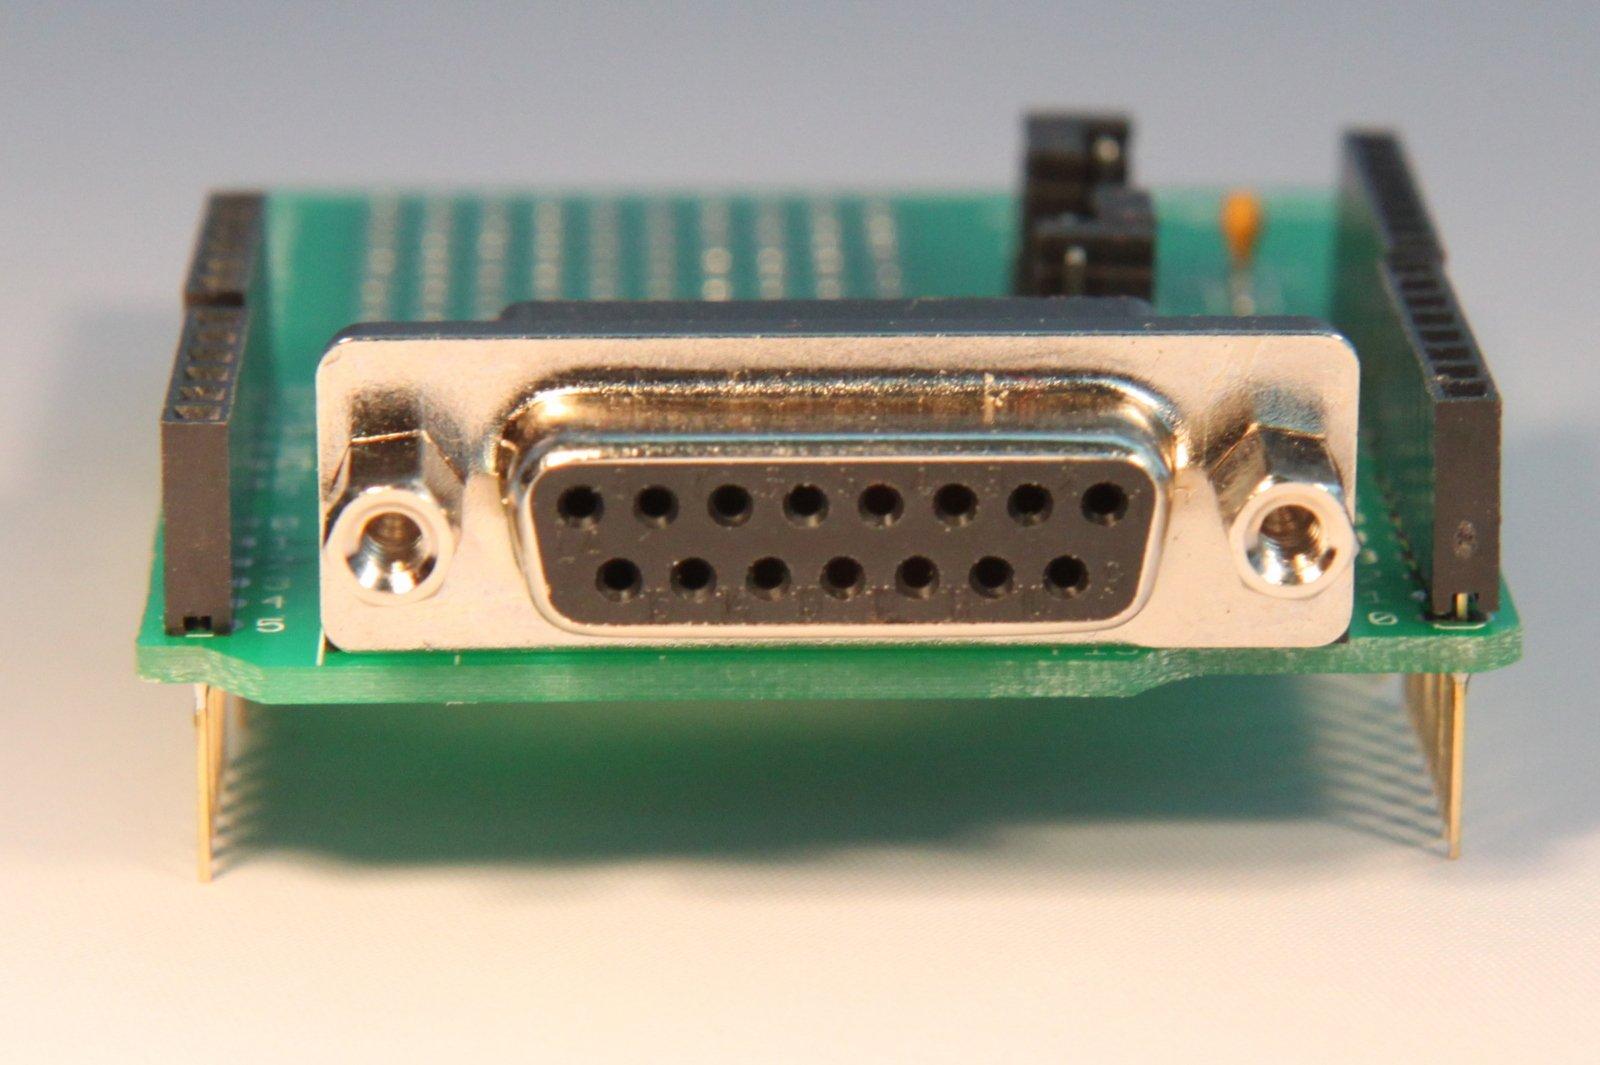 Arduino joystick shield for pc joysticks from lectrobox on